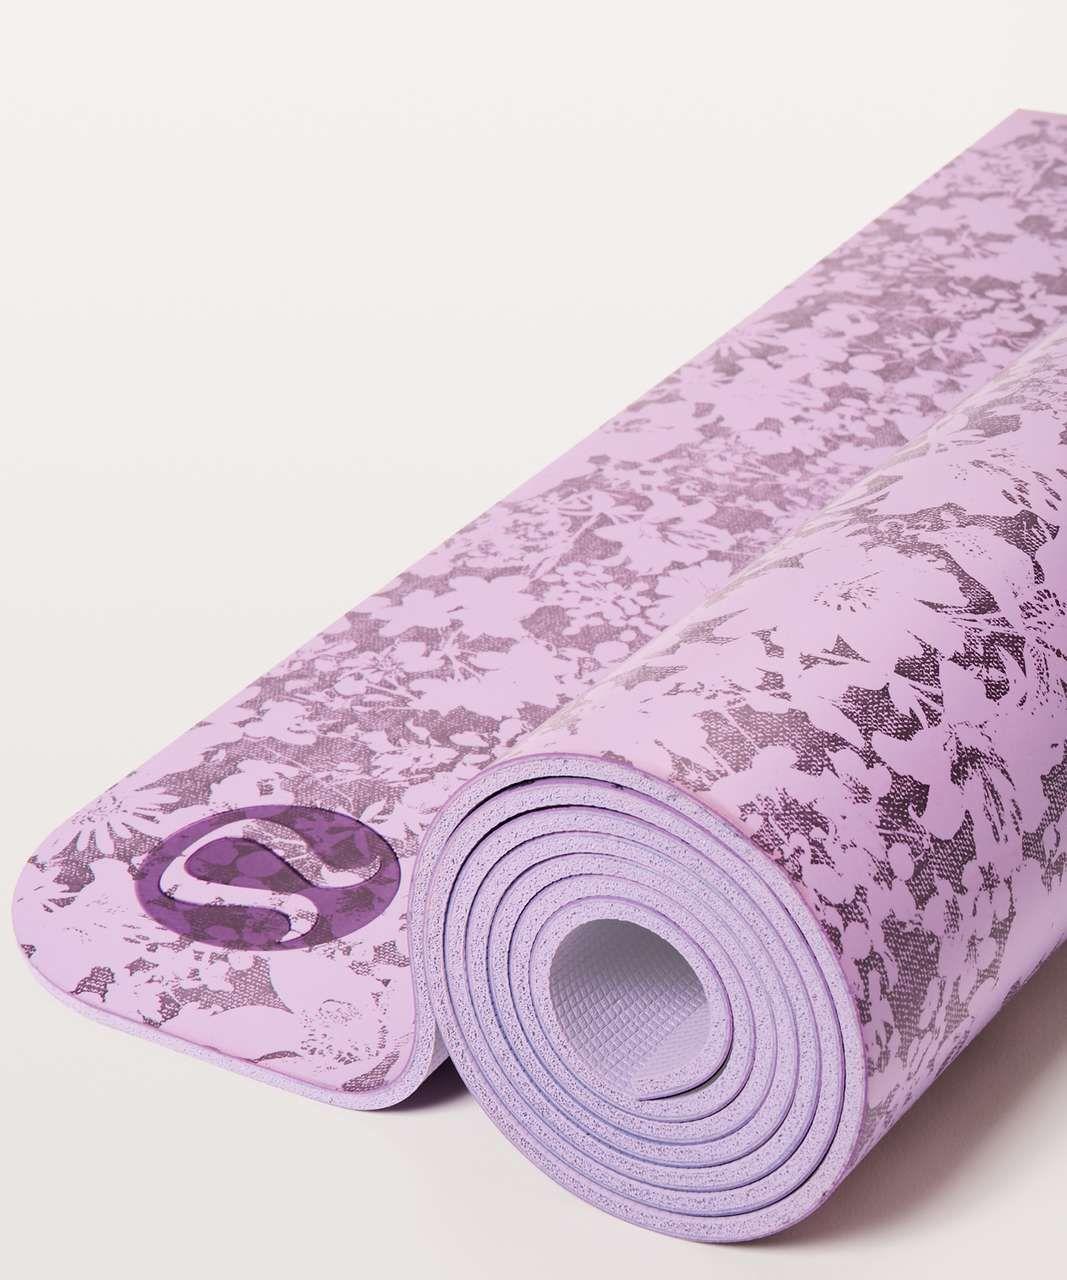 Lululemon The Reversible Mat 5mm Efflorescent Violetta Smoked Mulberry Violetta Lulu Fanatics Lululemon Yoga Mat Yoga Women Lululemon Mat